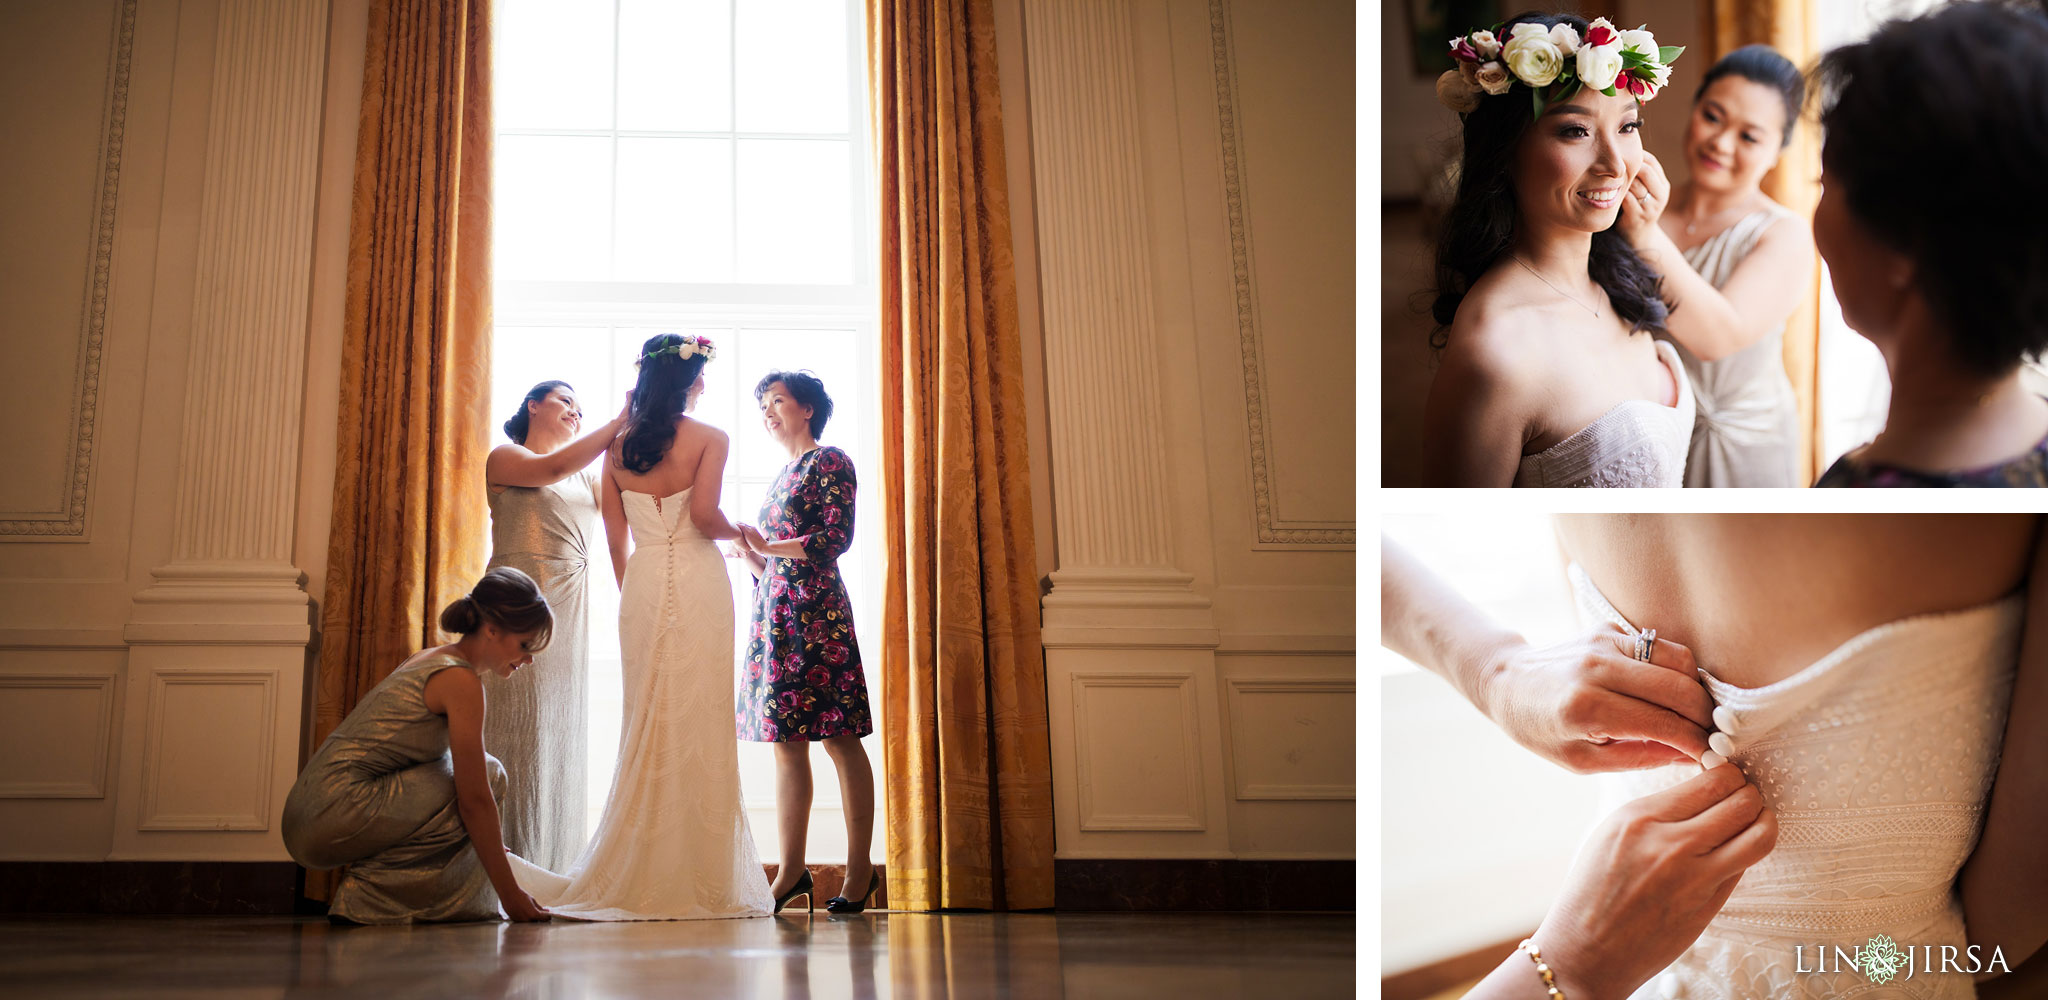 002 richard nixon library bride wedding photography